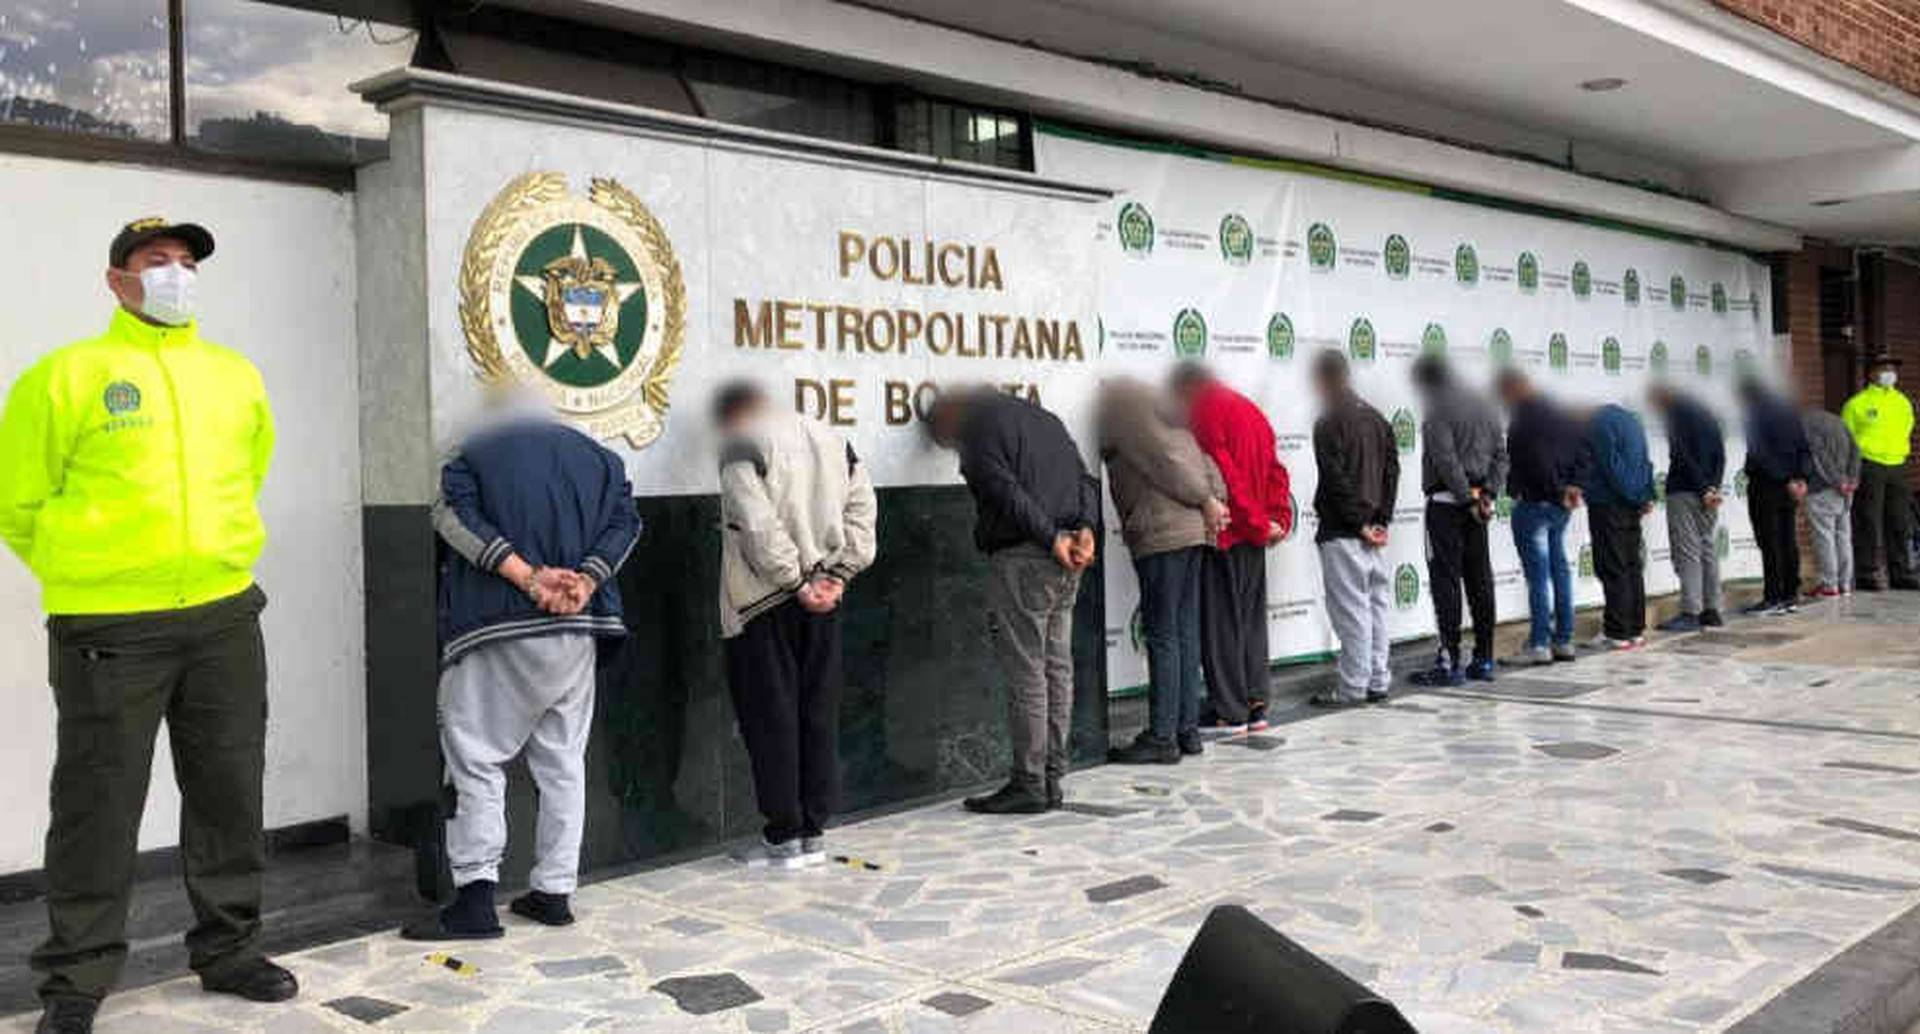 Caen 12 presuntos responsables de abusos sexuales contra menores en Bogotá